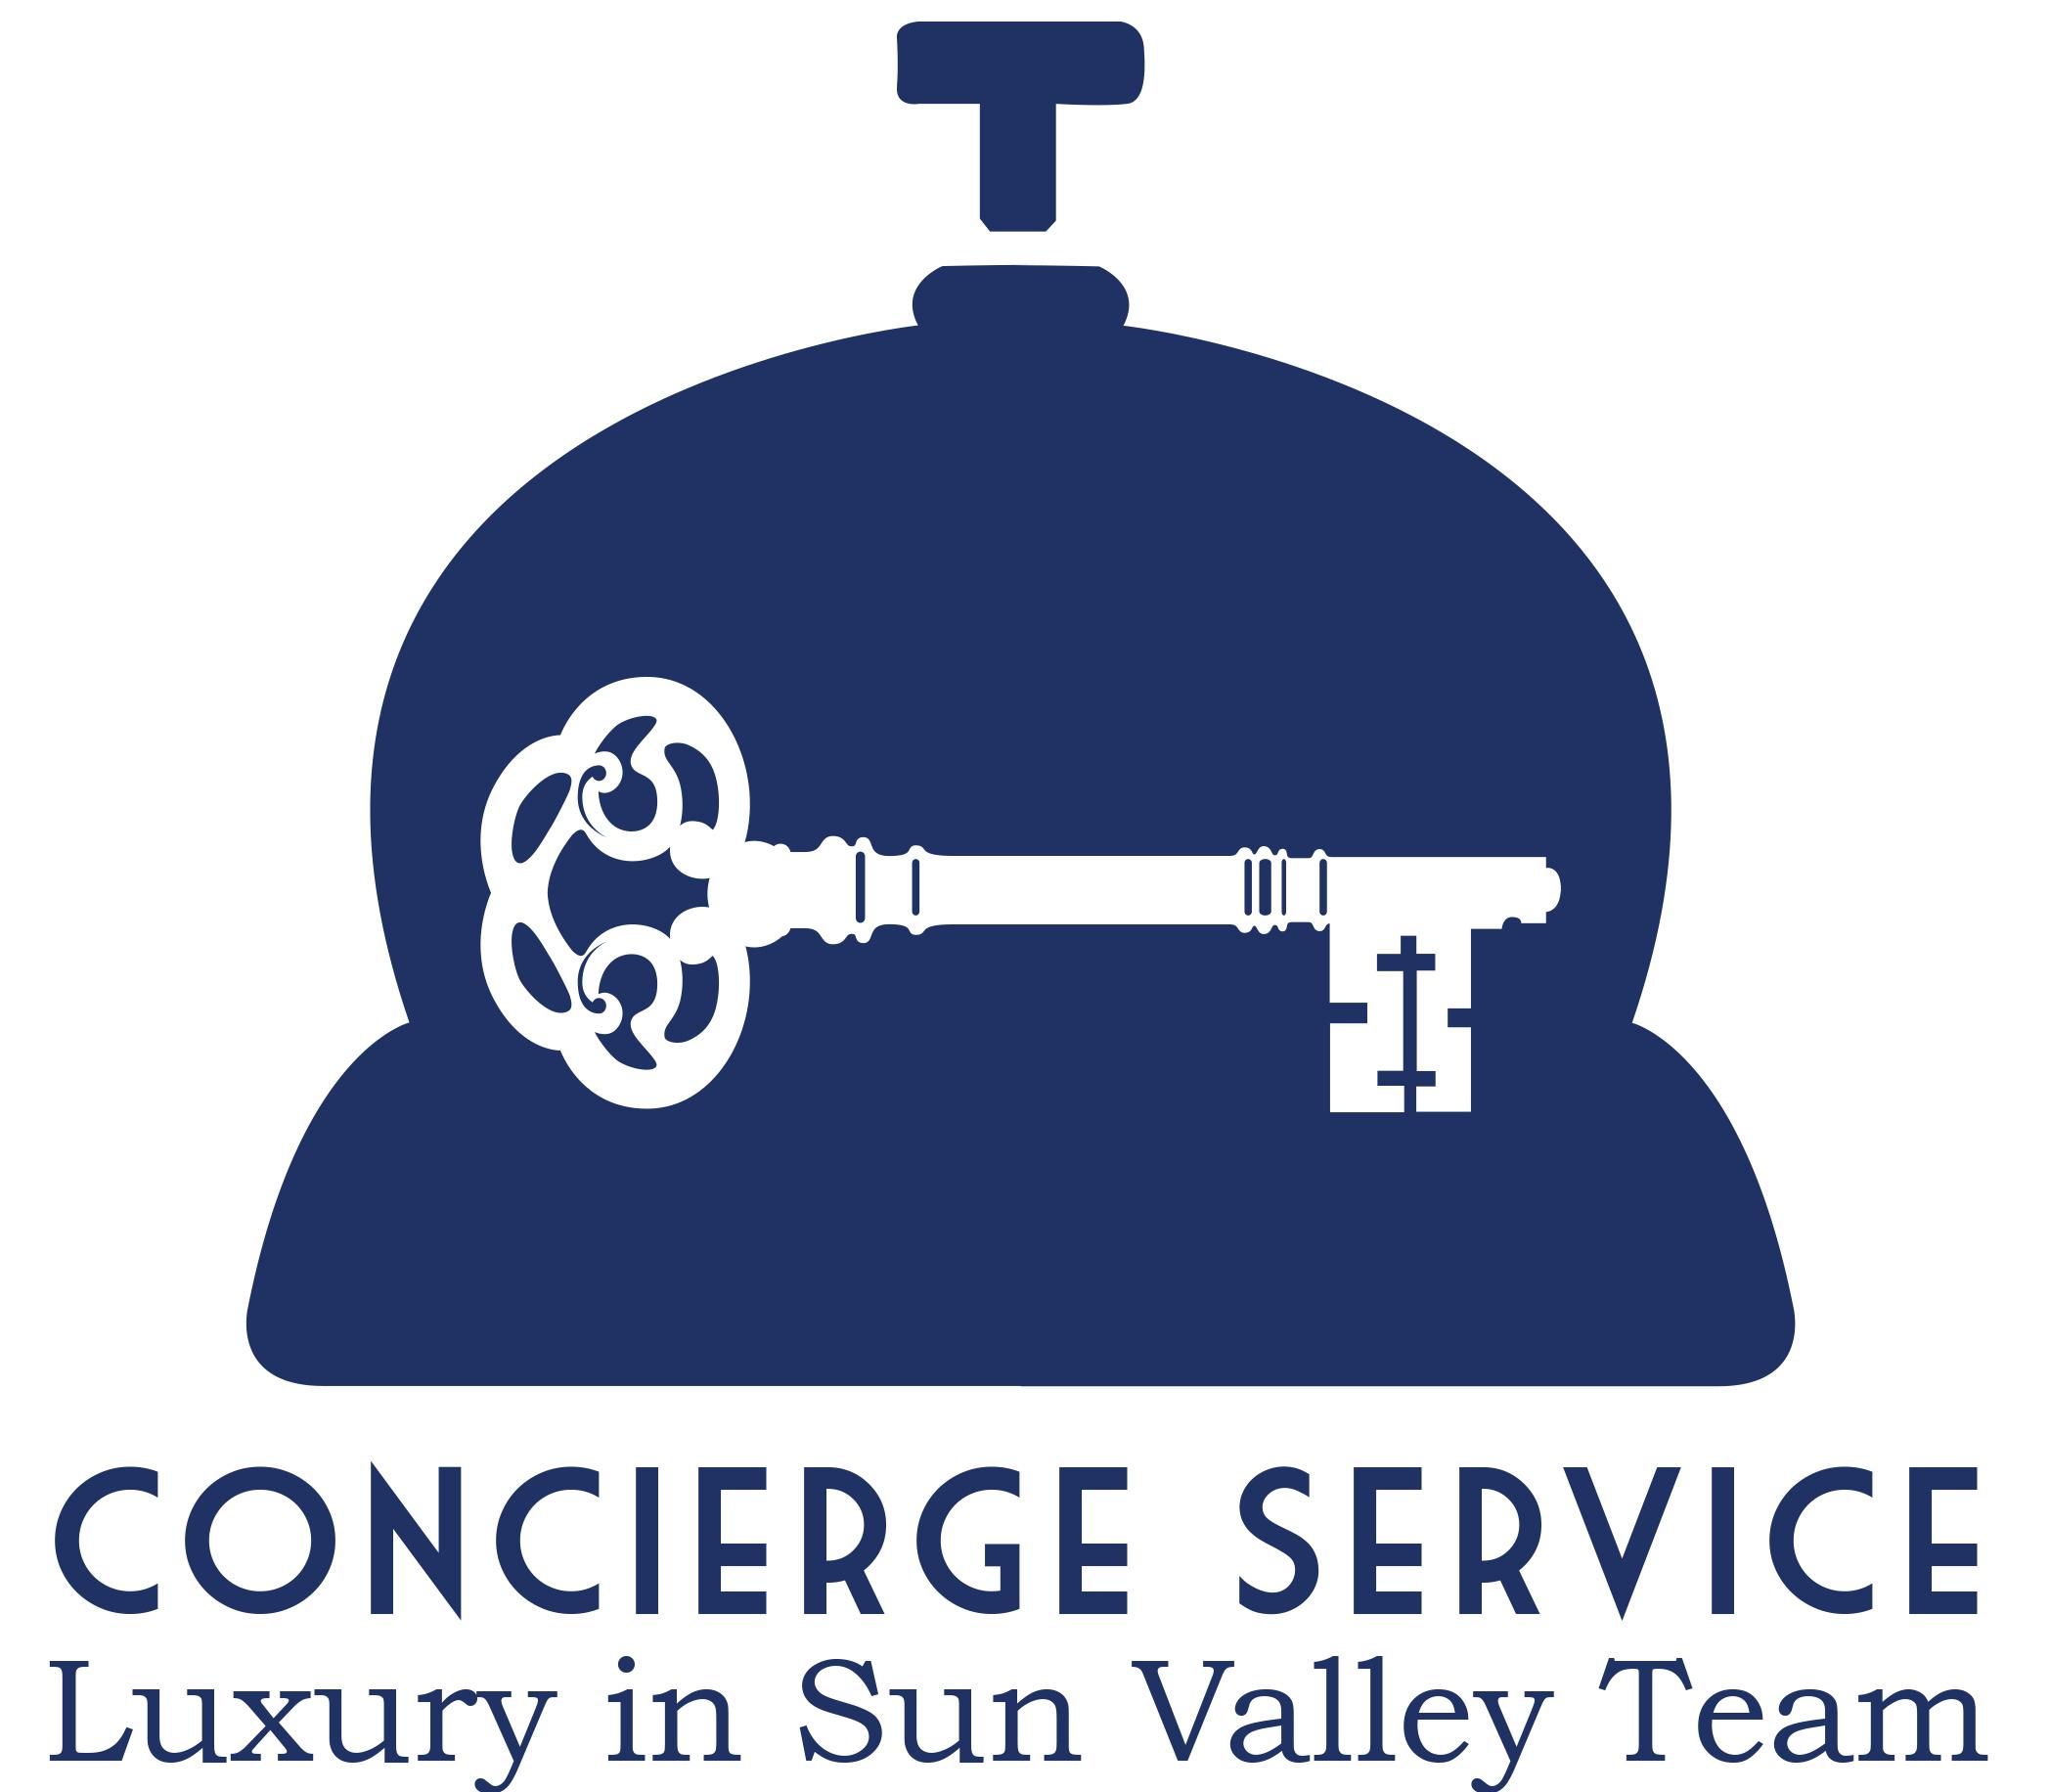 Concierge Service Image